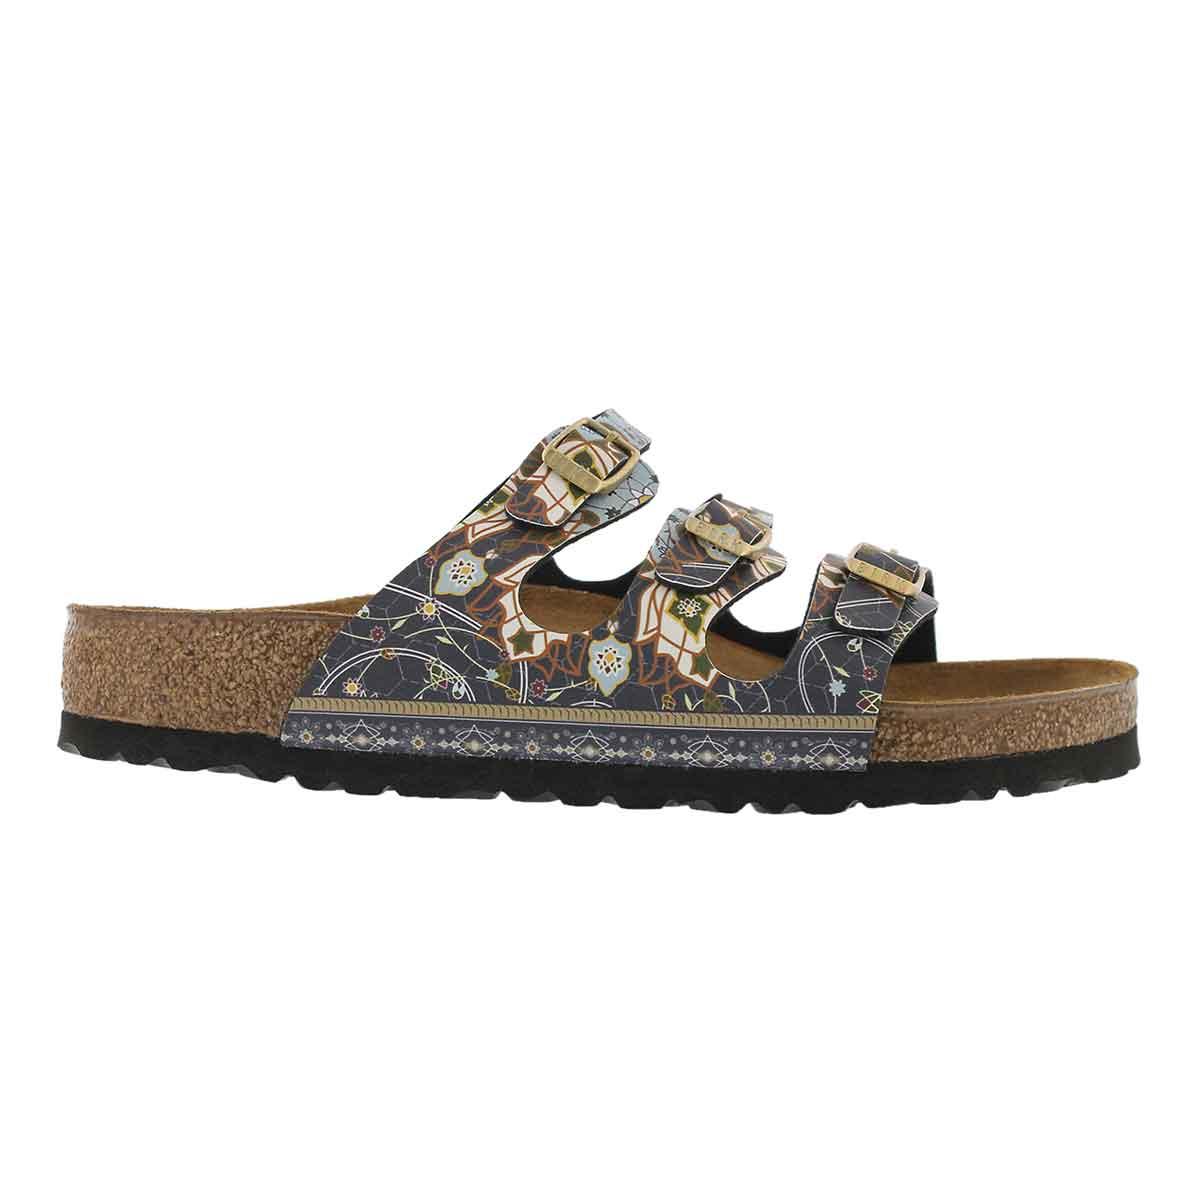 Lds Florida BF ancient mosaic blu sandal